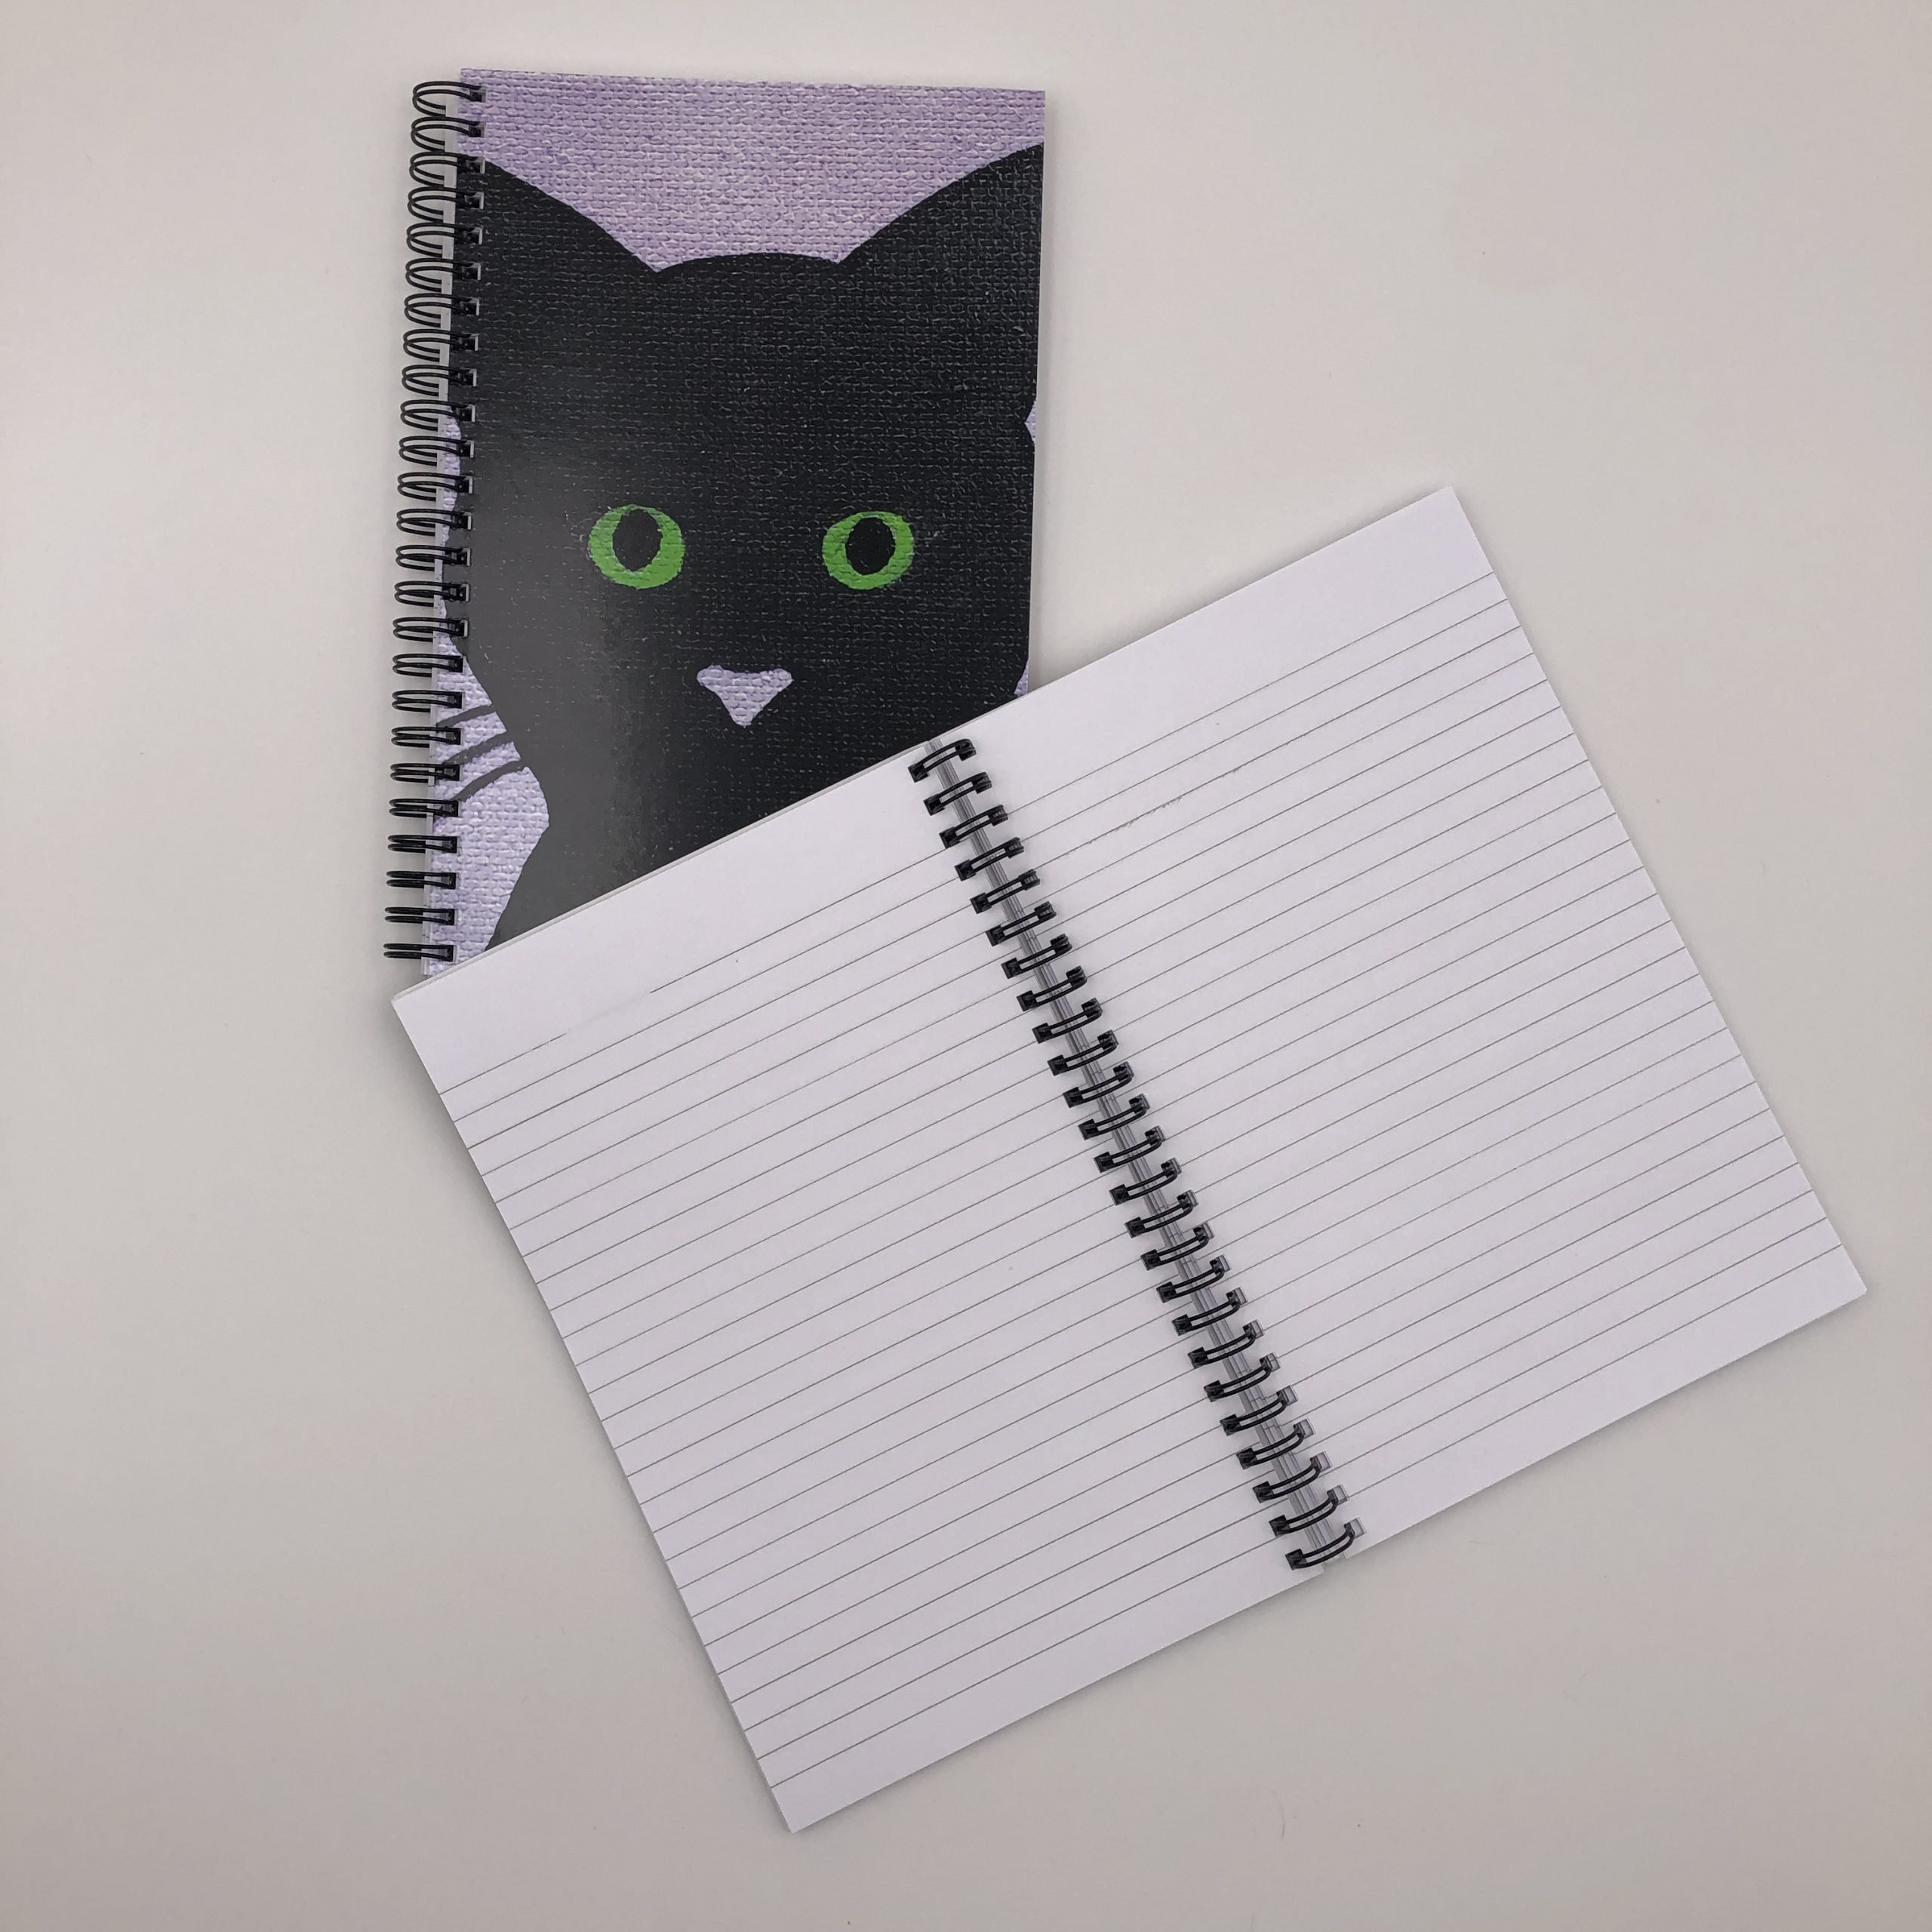 Shadow notebook